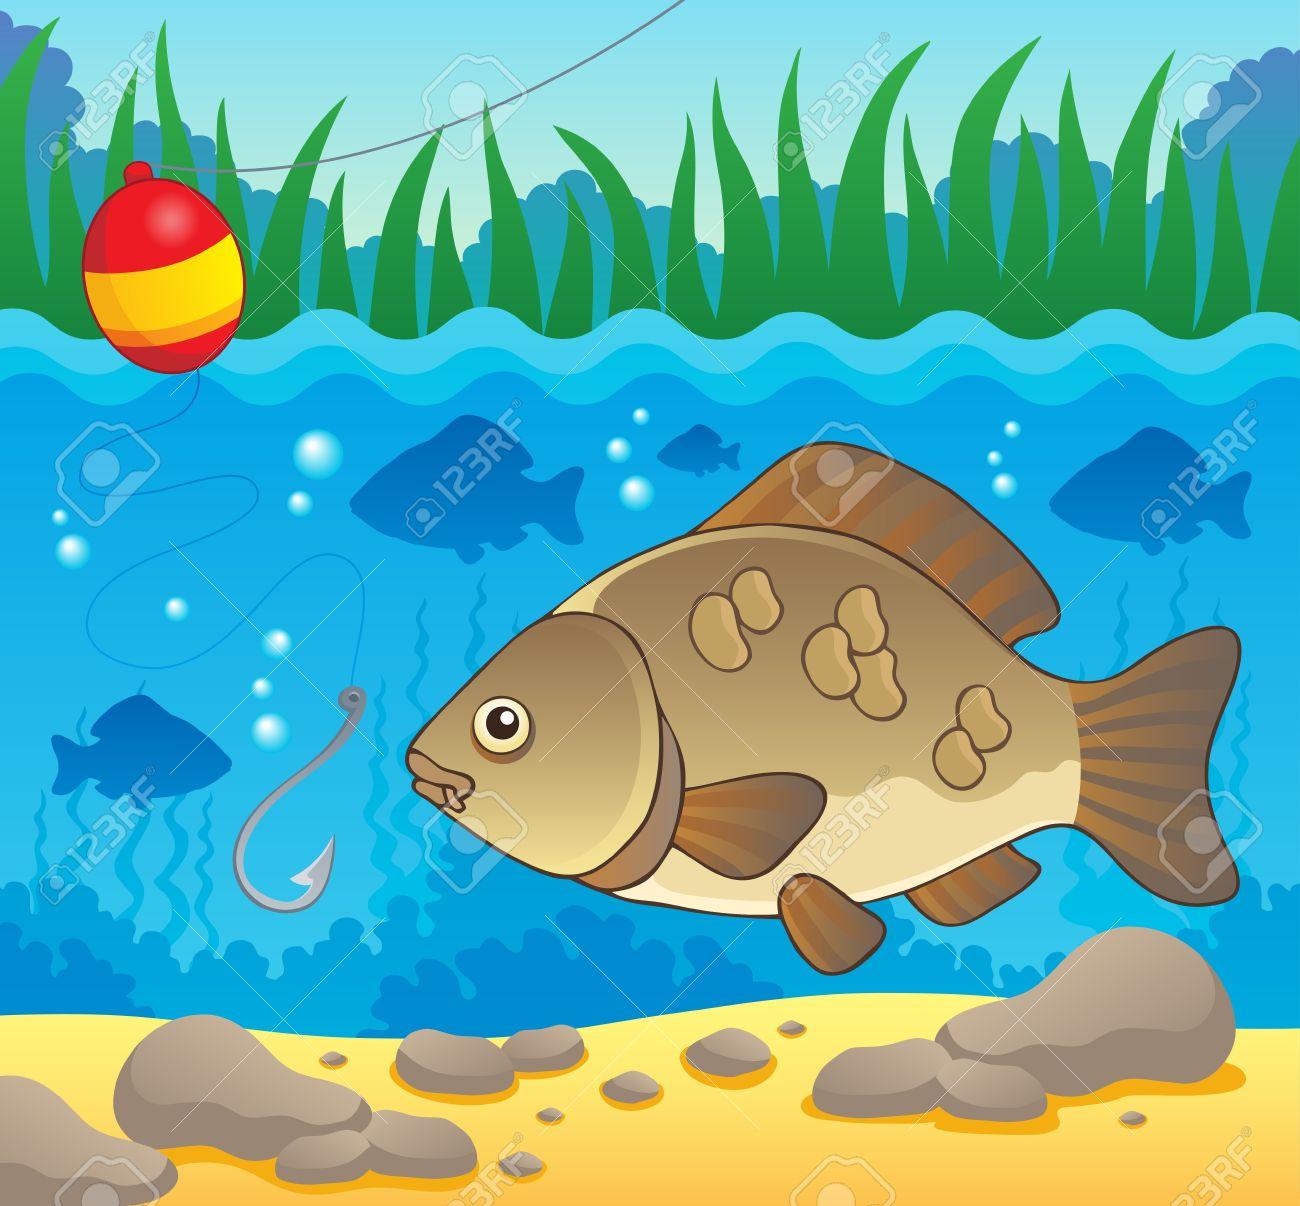 Live clipart fish.